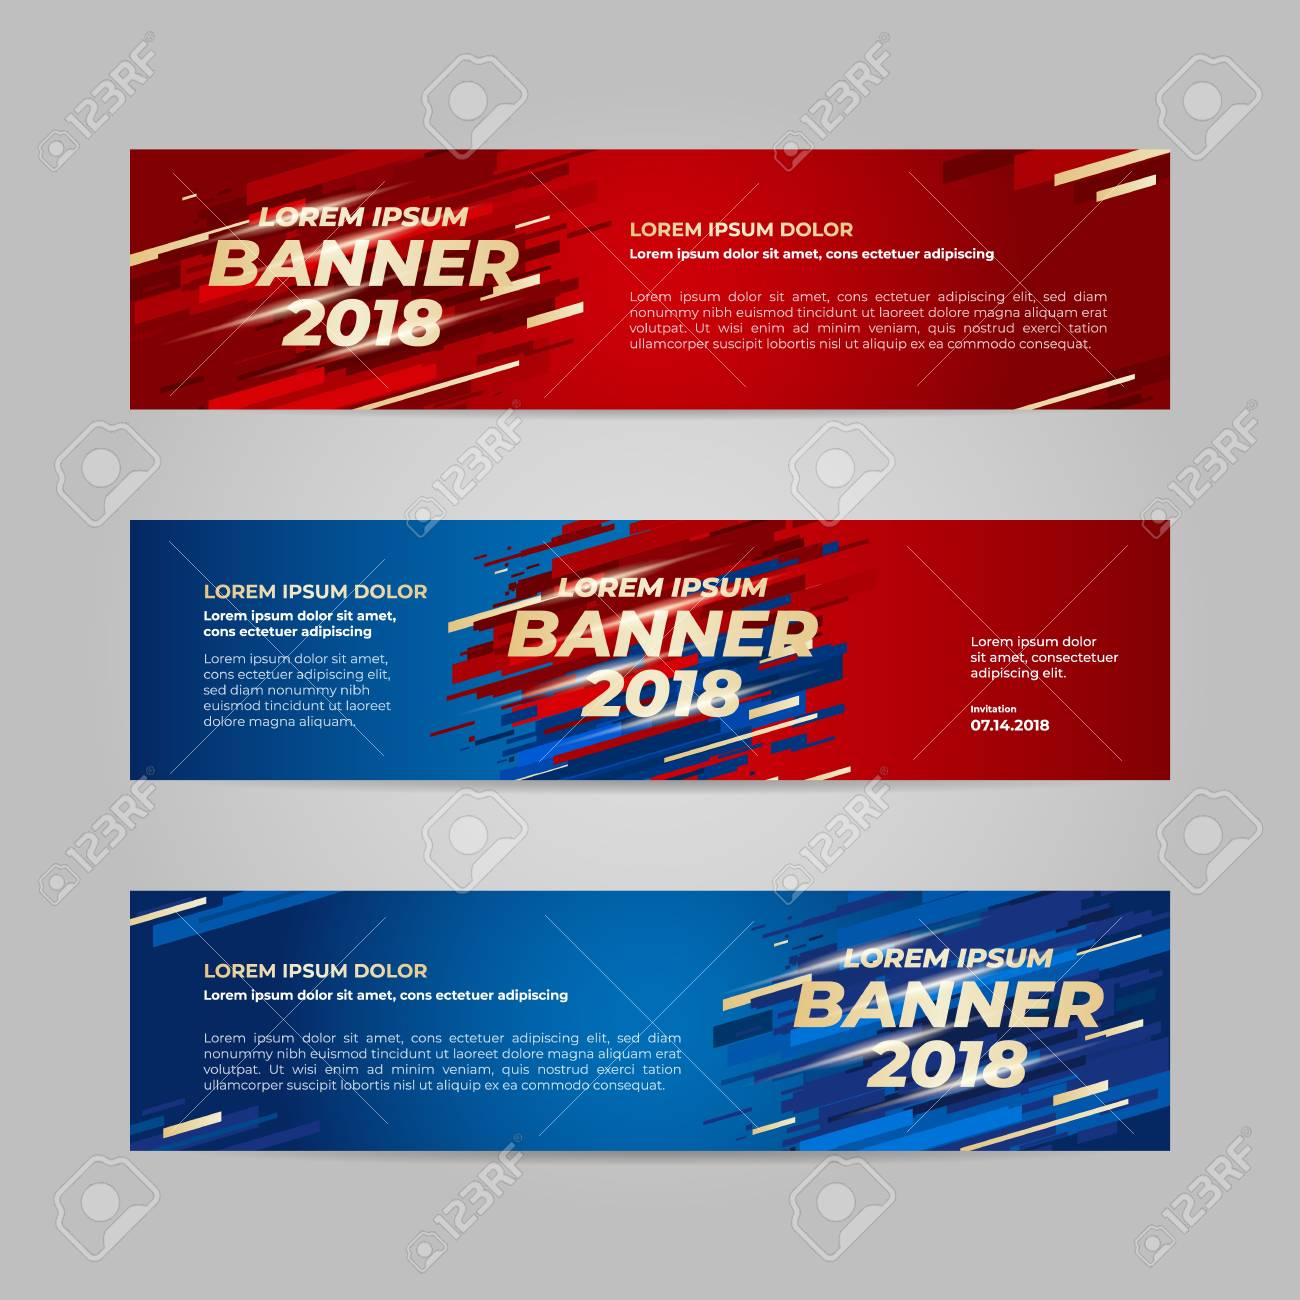 Vector Design Banner Web Template For Sport Event, 2018 Trend Regarding Event Banner Template